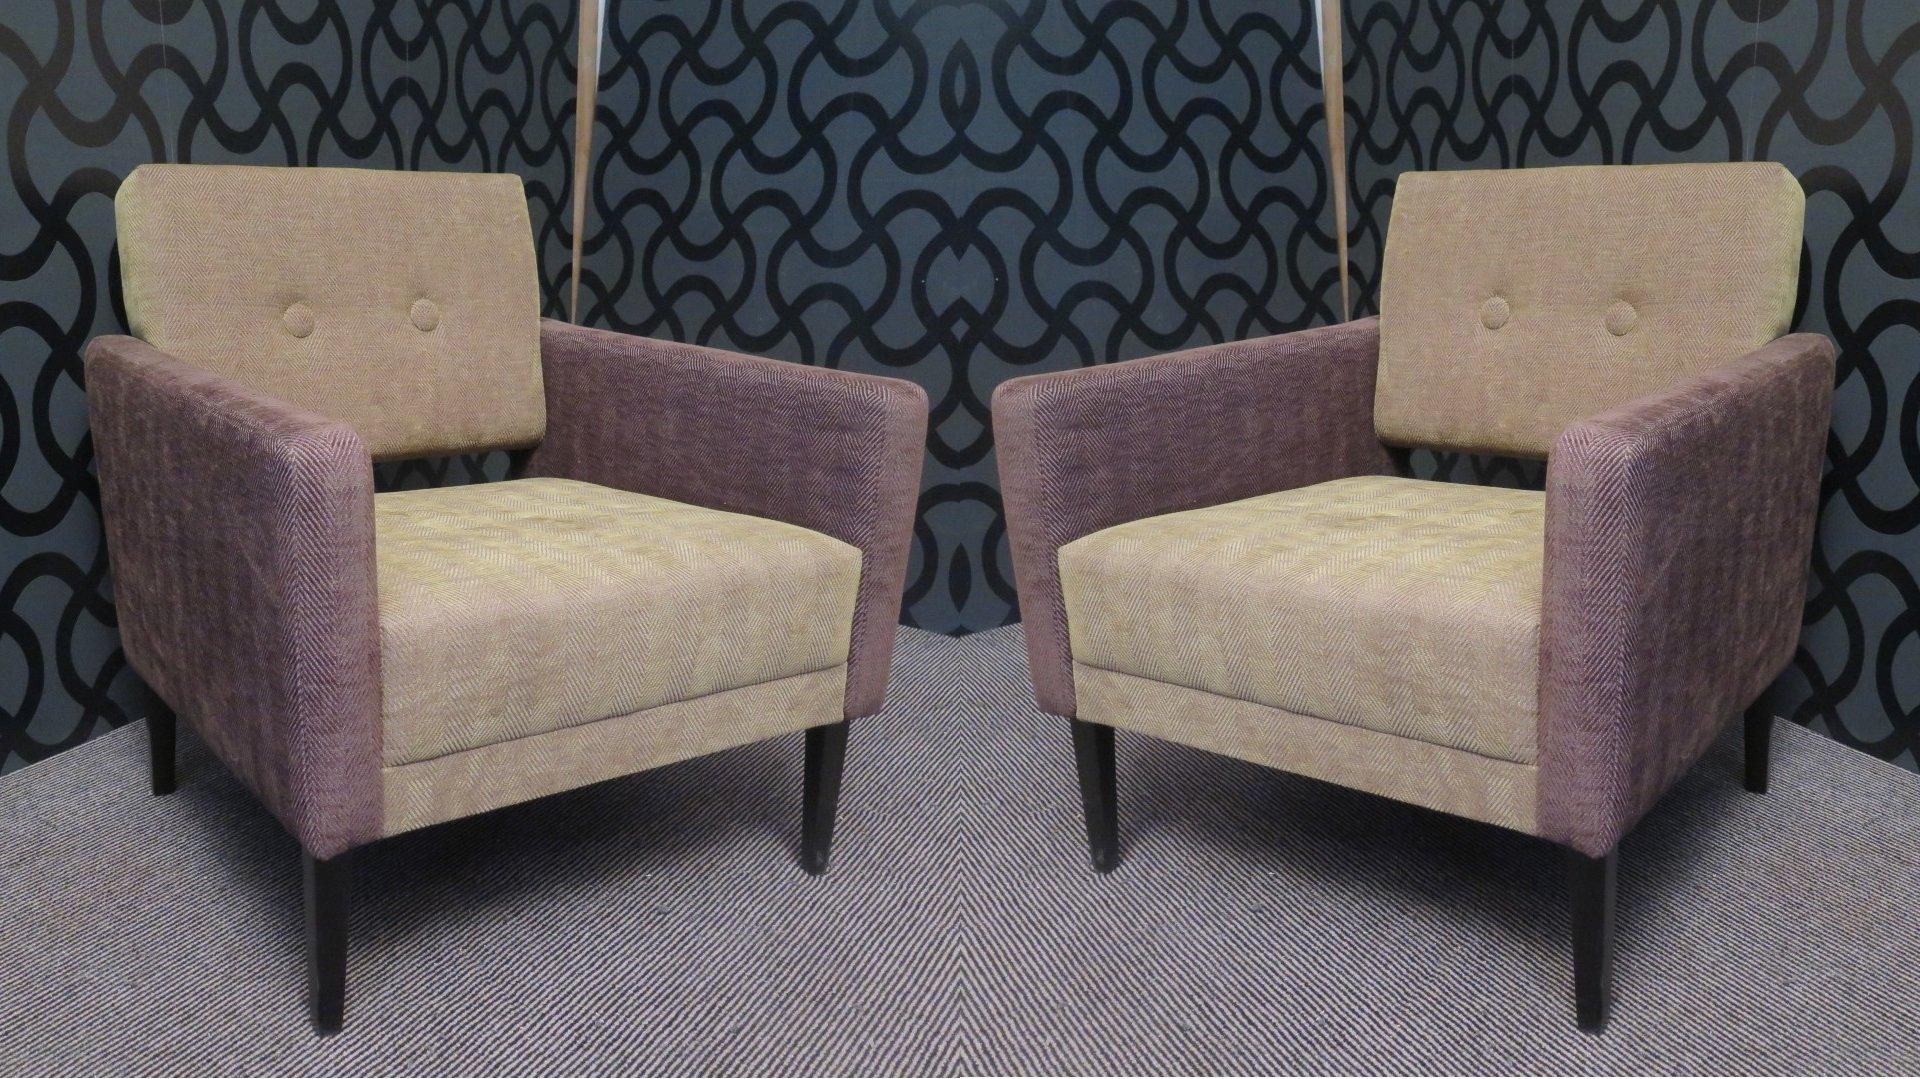 italienische sessel aus samt in gr n lila 1950er 2er set bei pamono kaufen. Black Bedroom Furniture Sets. Home Design Ideas